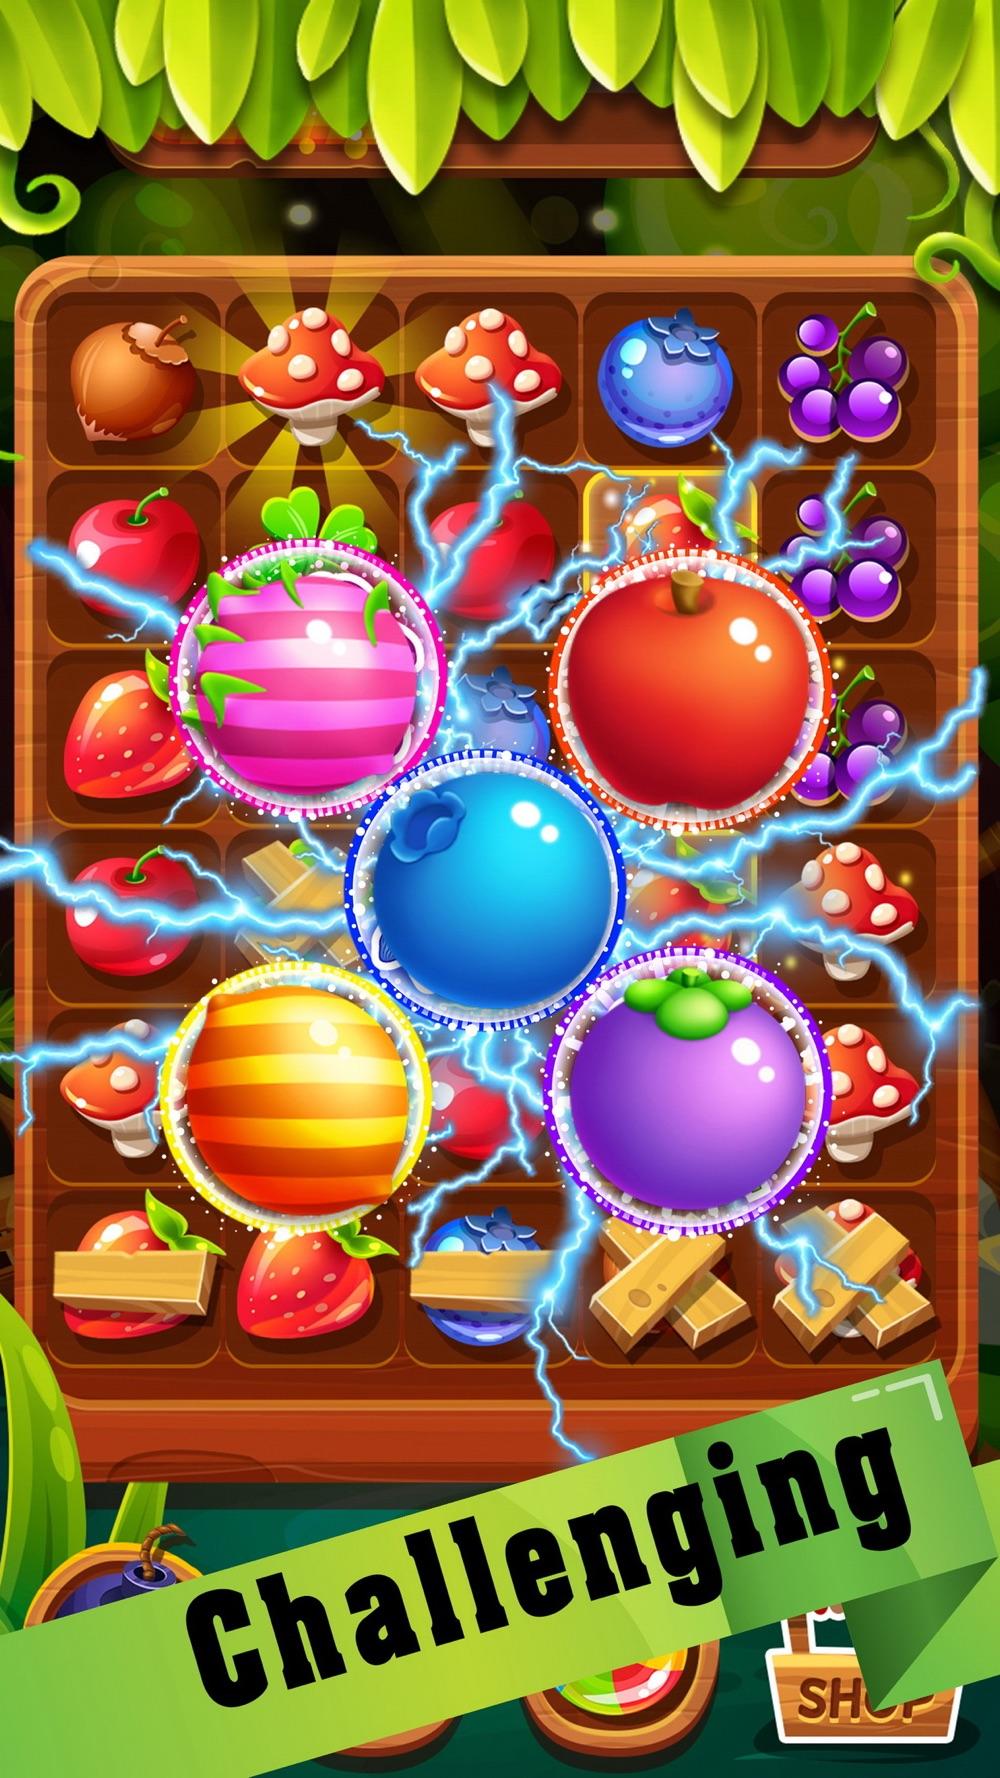 Fruit candy magic match 3 games hack tool